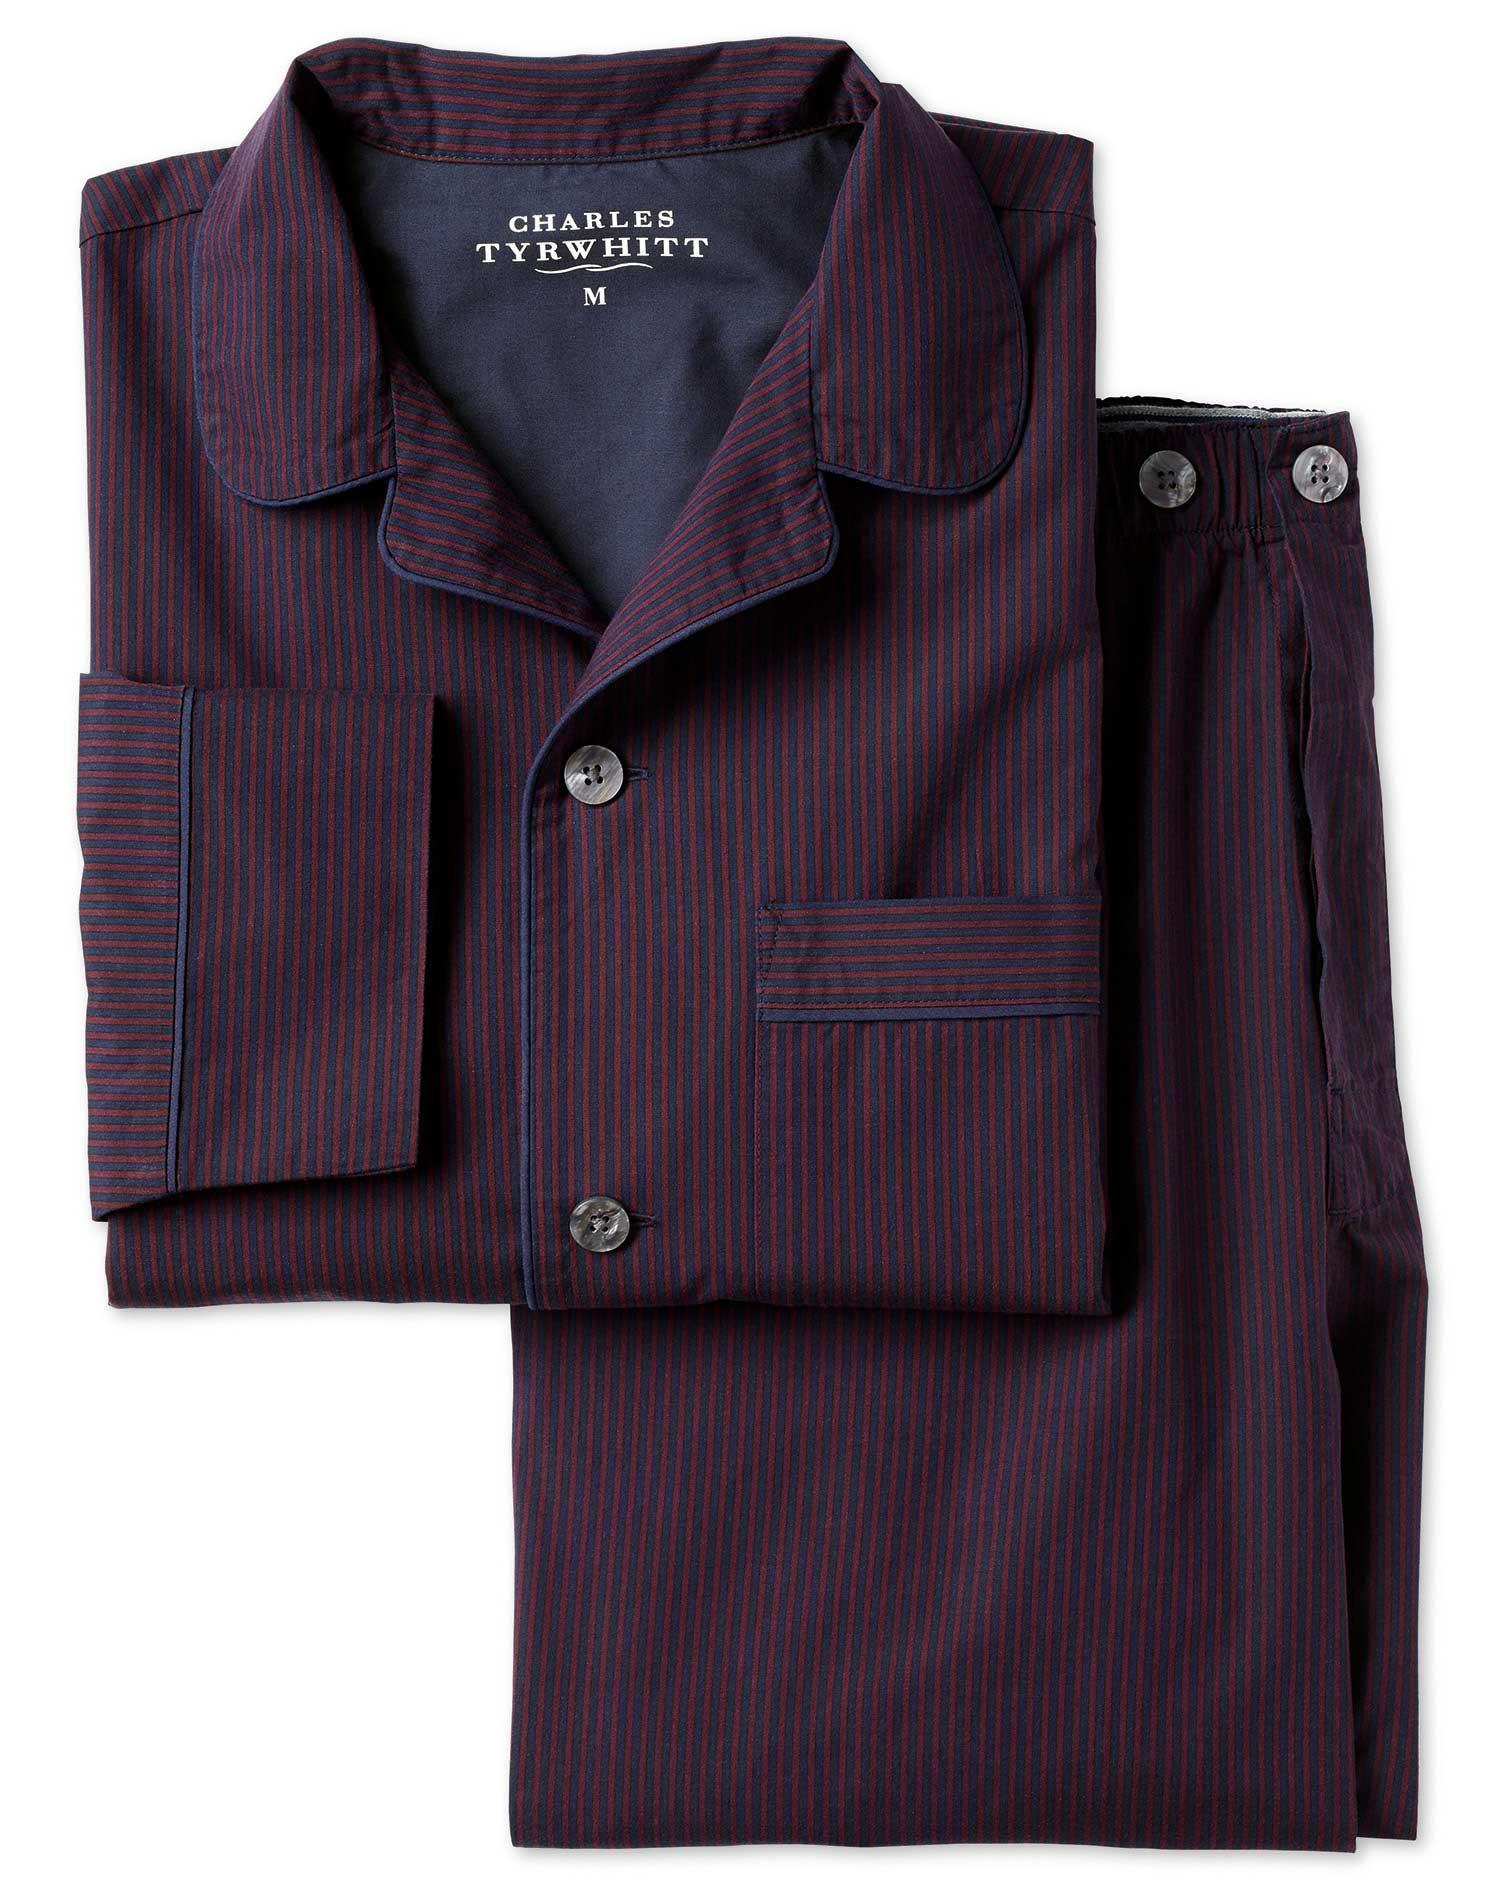 Red and Navy Stripe Pyjama Set Size Medium by Charles Tyrwhitt